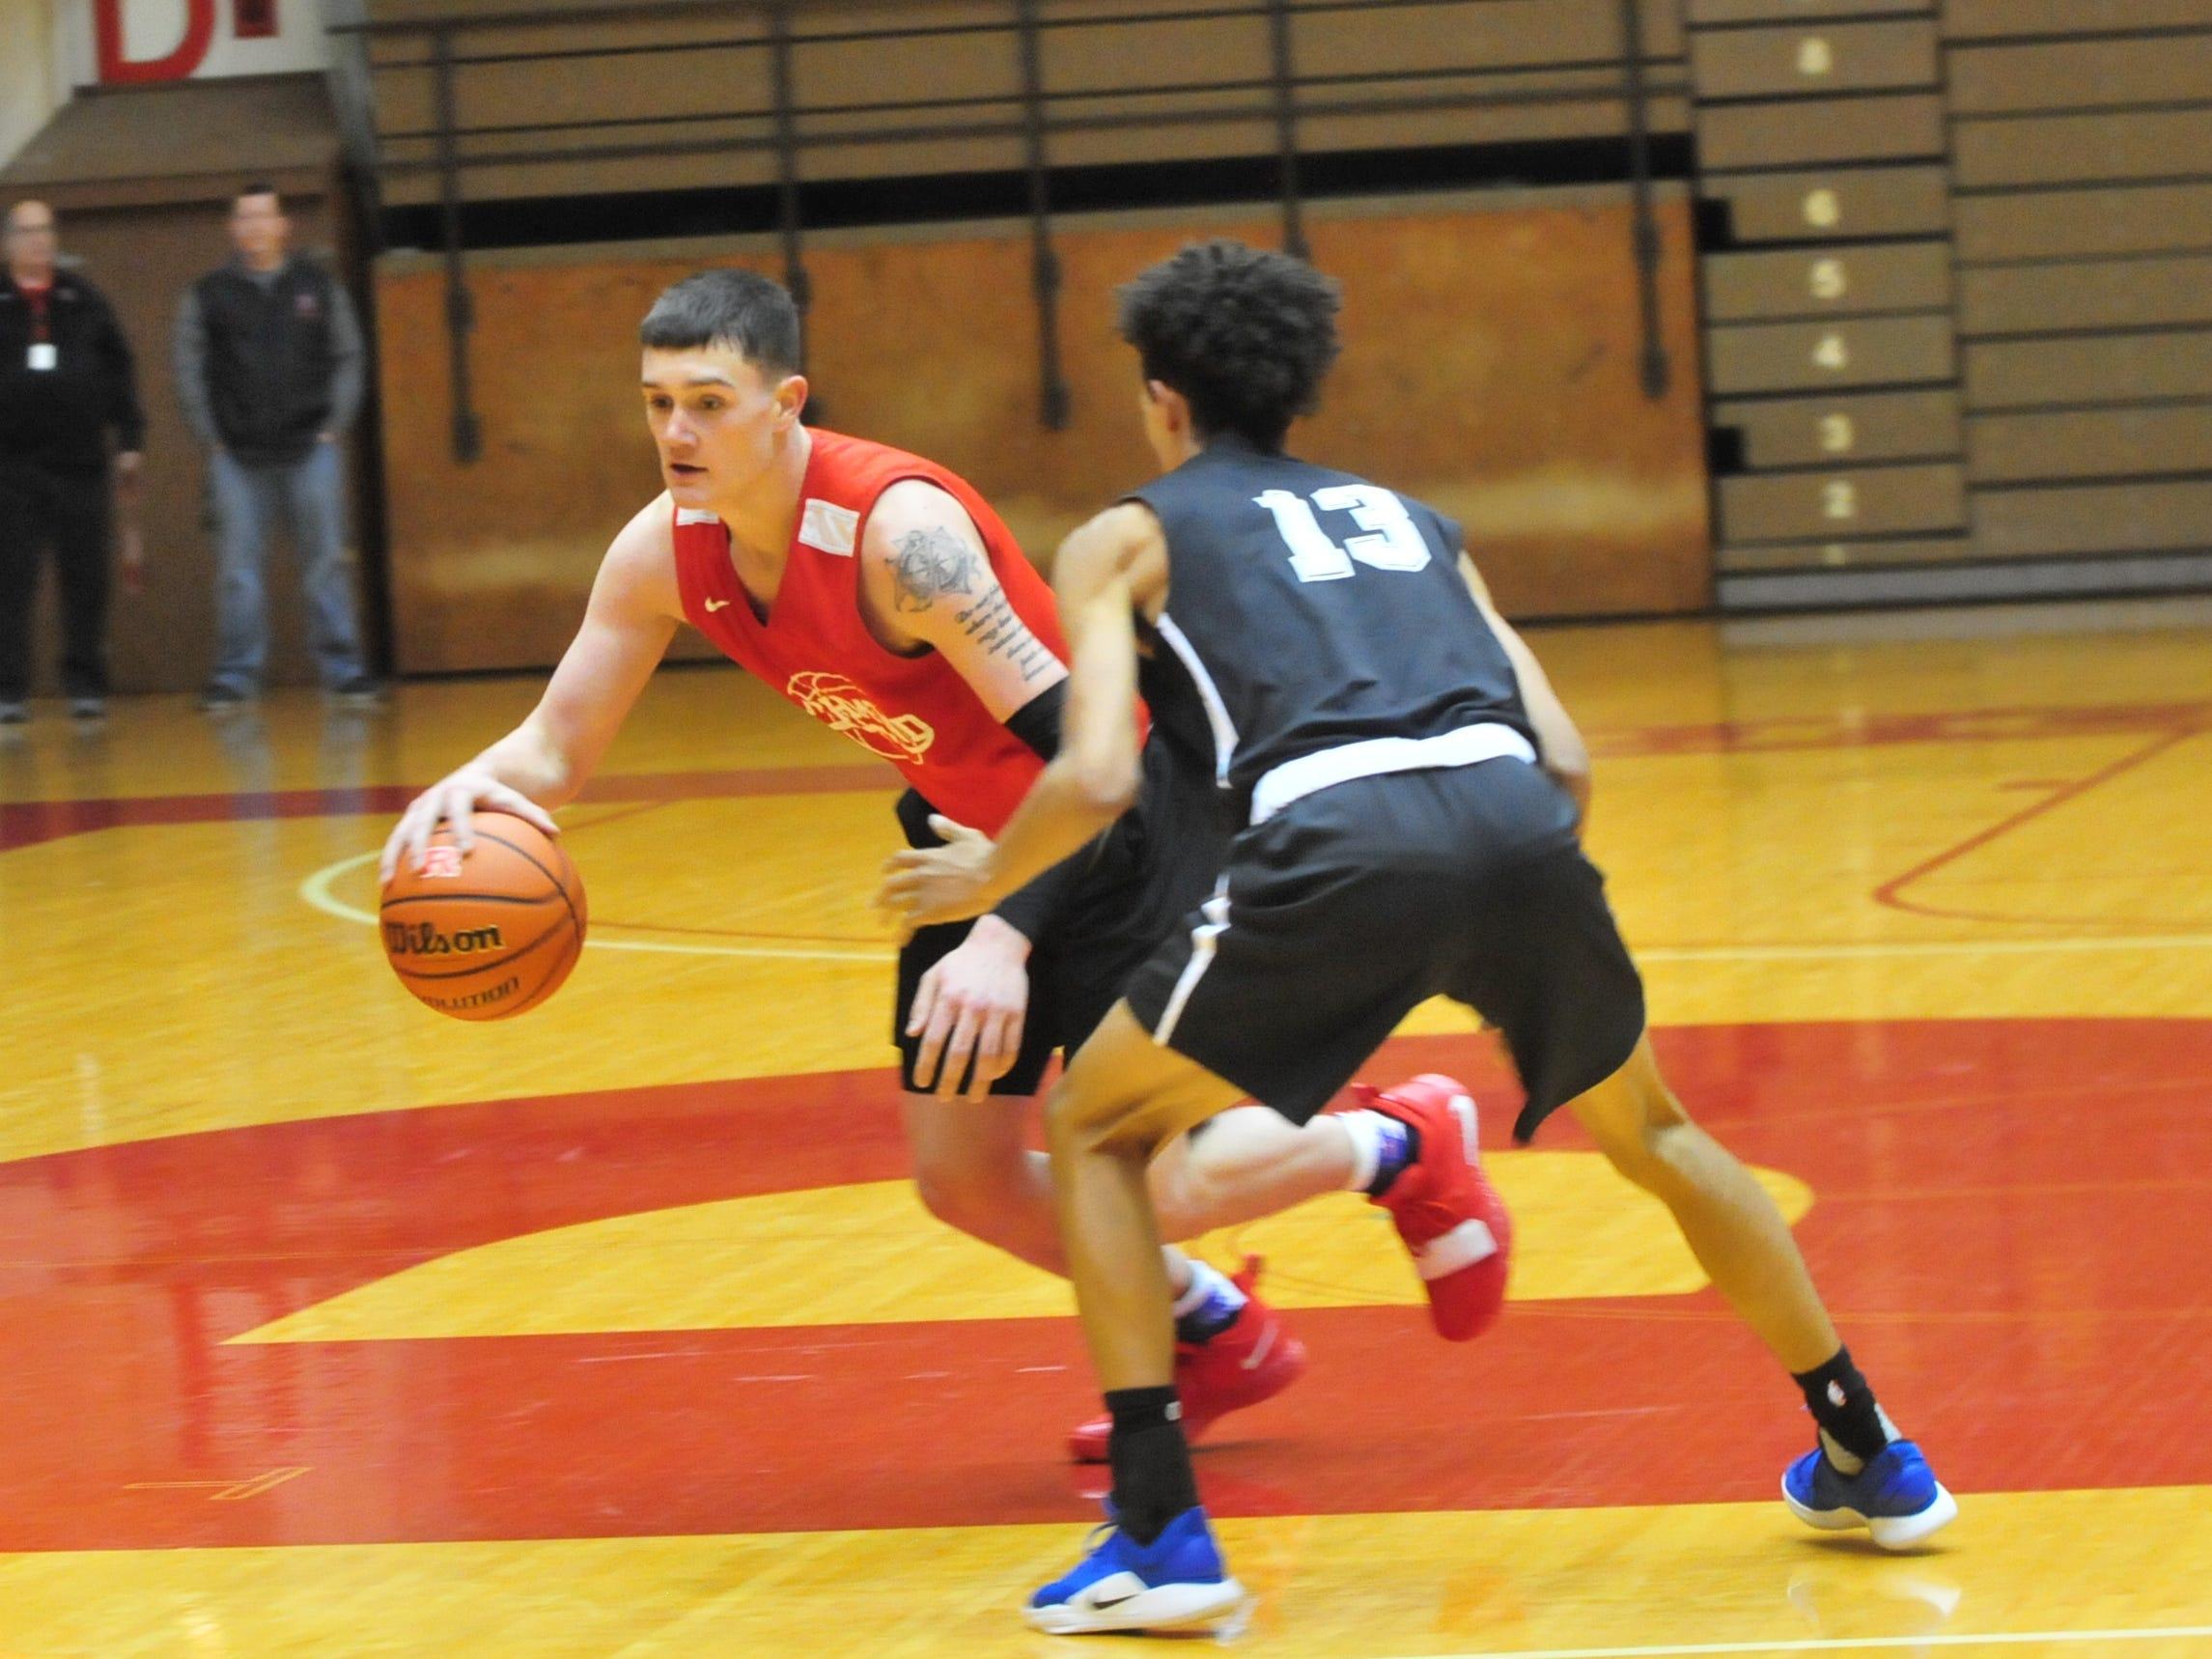 Richmond High School senior Lucas Kroft moves the ball during a boys basketball scrimmage against Franklin Central Saturday, Nov. 17, 2018 at Richmond High School's Tiernan Center.